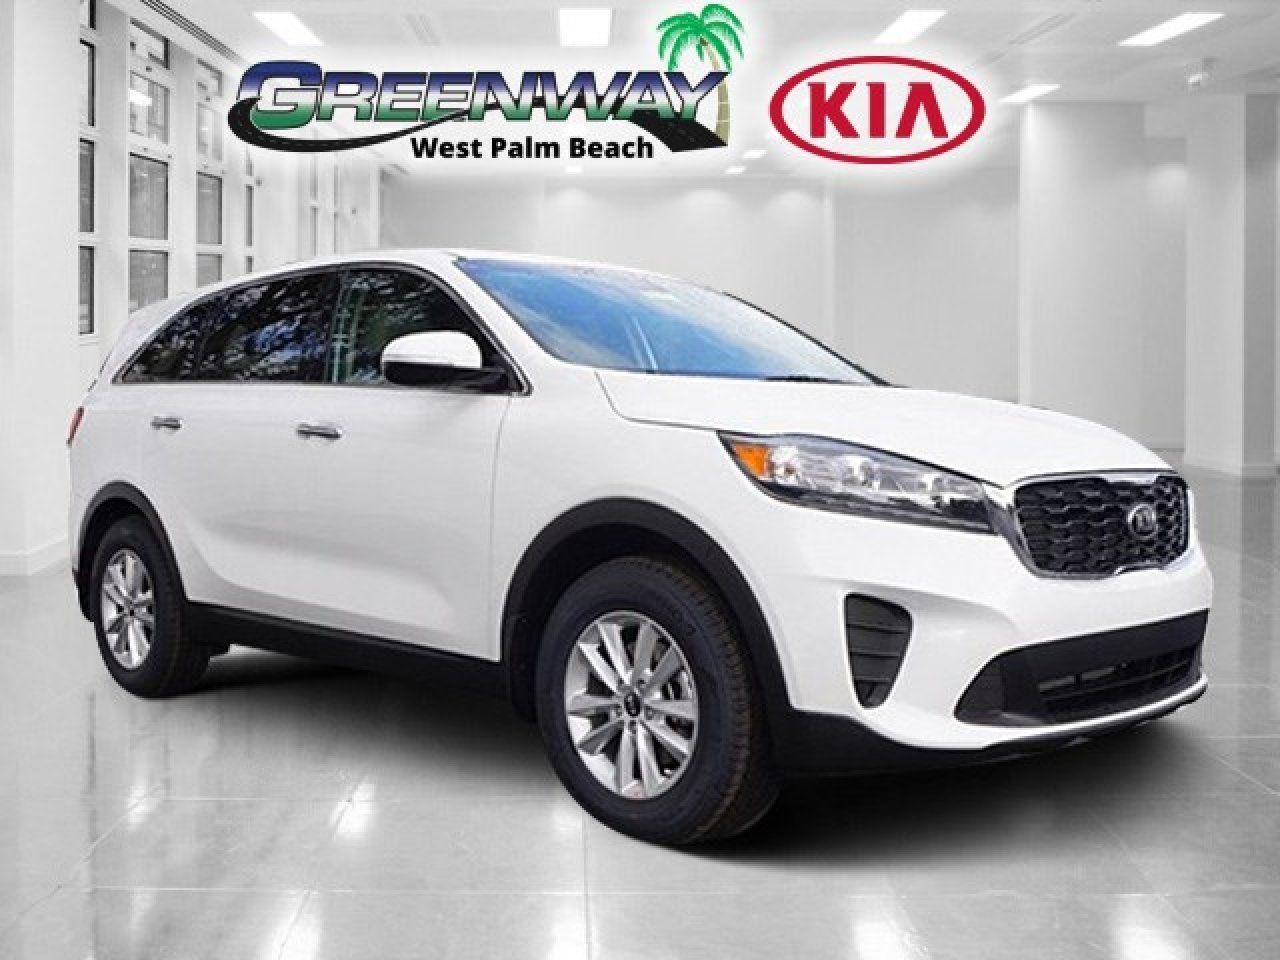 Details Here Https Dantuckerautos Com New Kia Optima Lease Miami Kia Optima Kia Kia Sorento